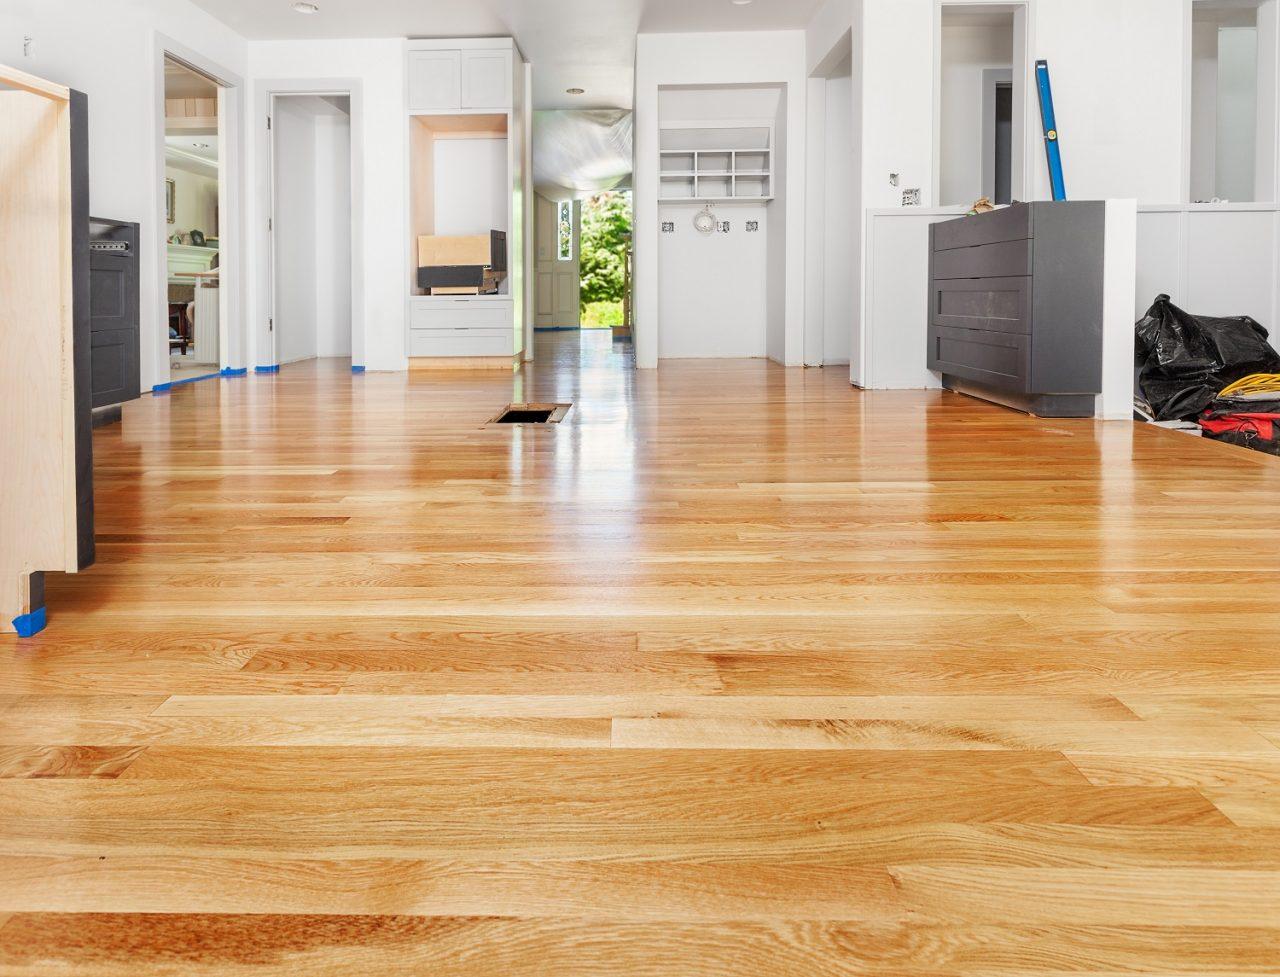 What's Better: Solid vs Engineered Hardwood Flooring